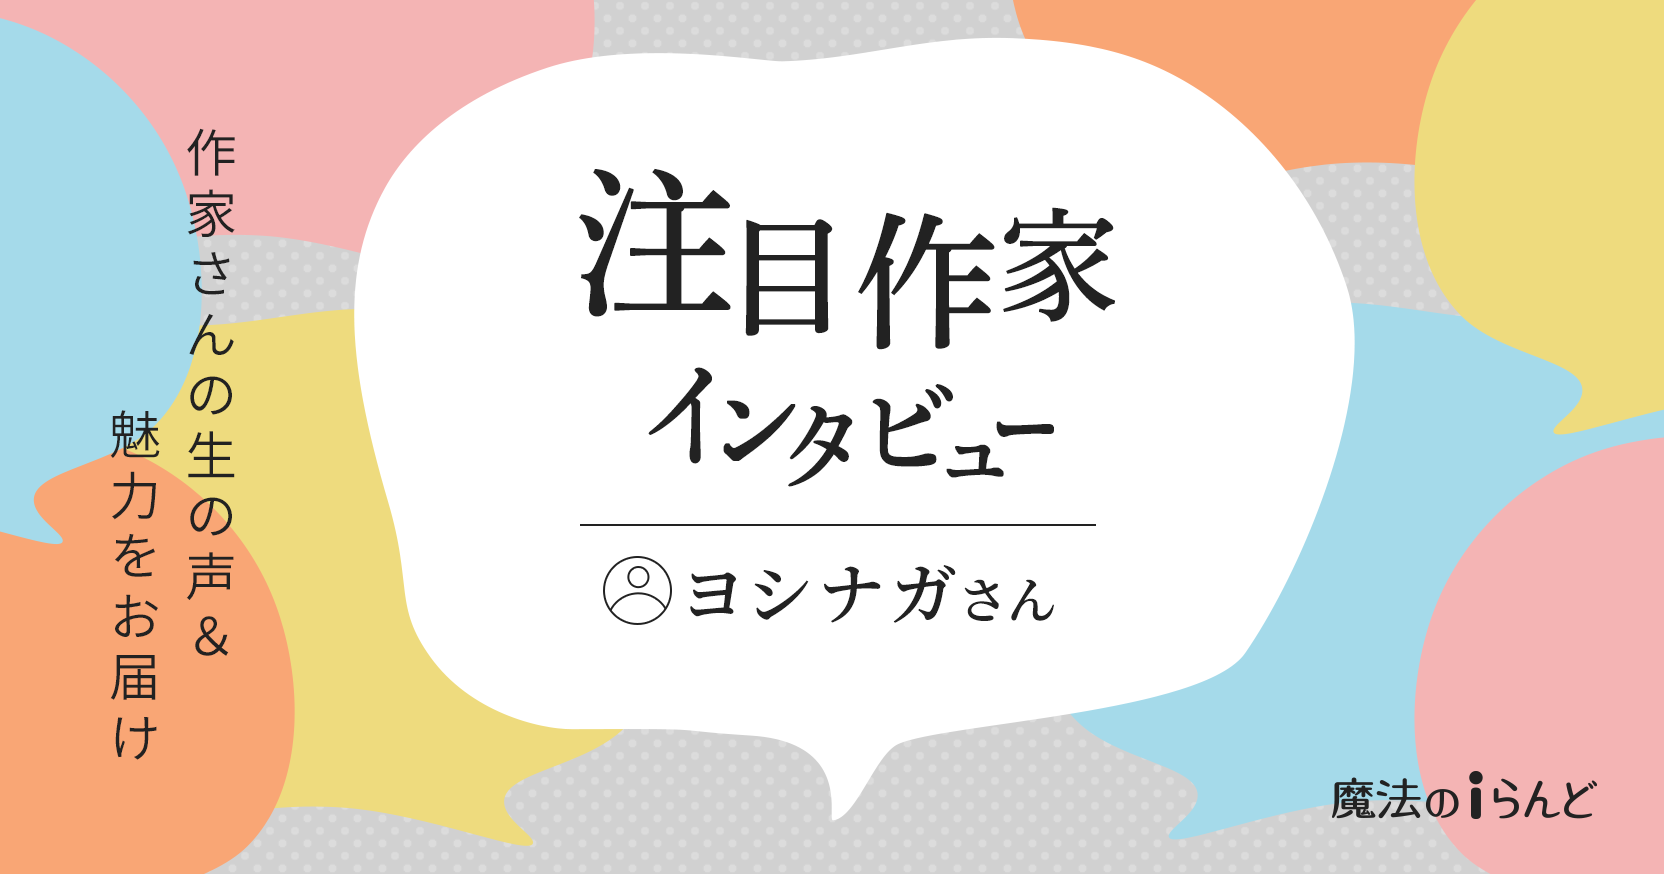 https://storage.googleapis.com/blog-info/entry/2020/12/interview_ogp_yoshinaga.png